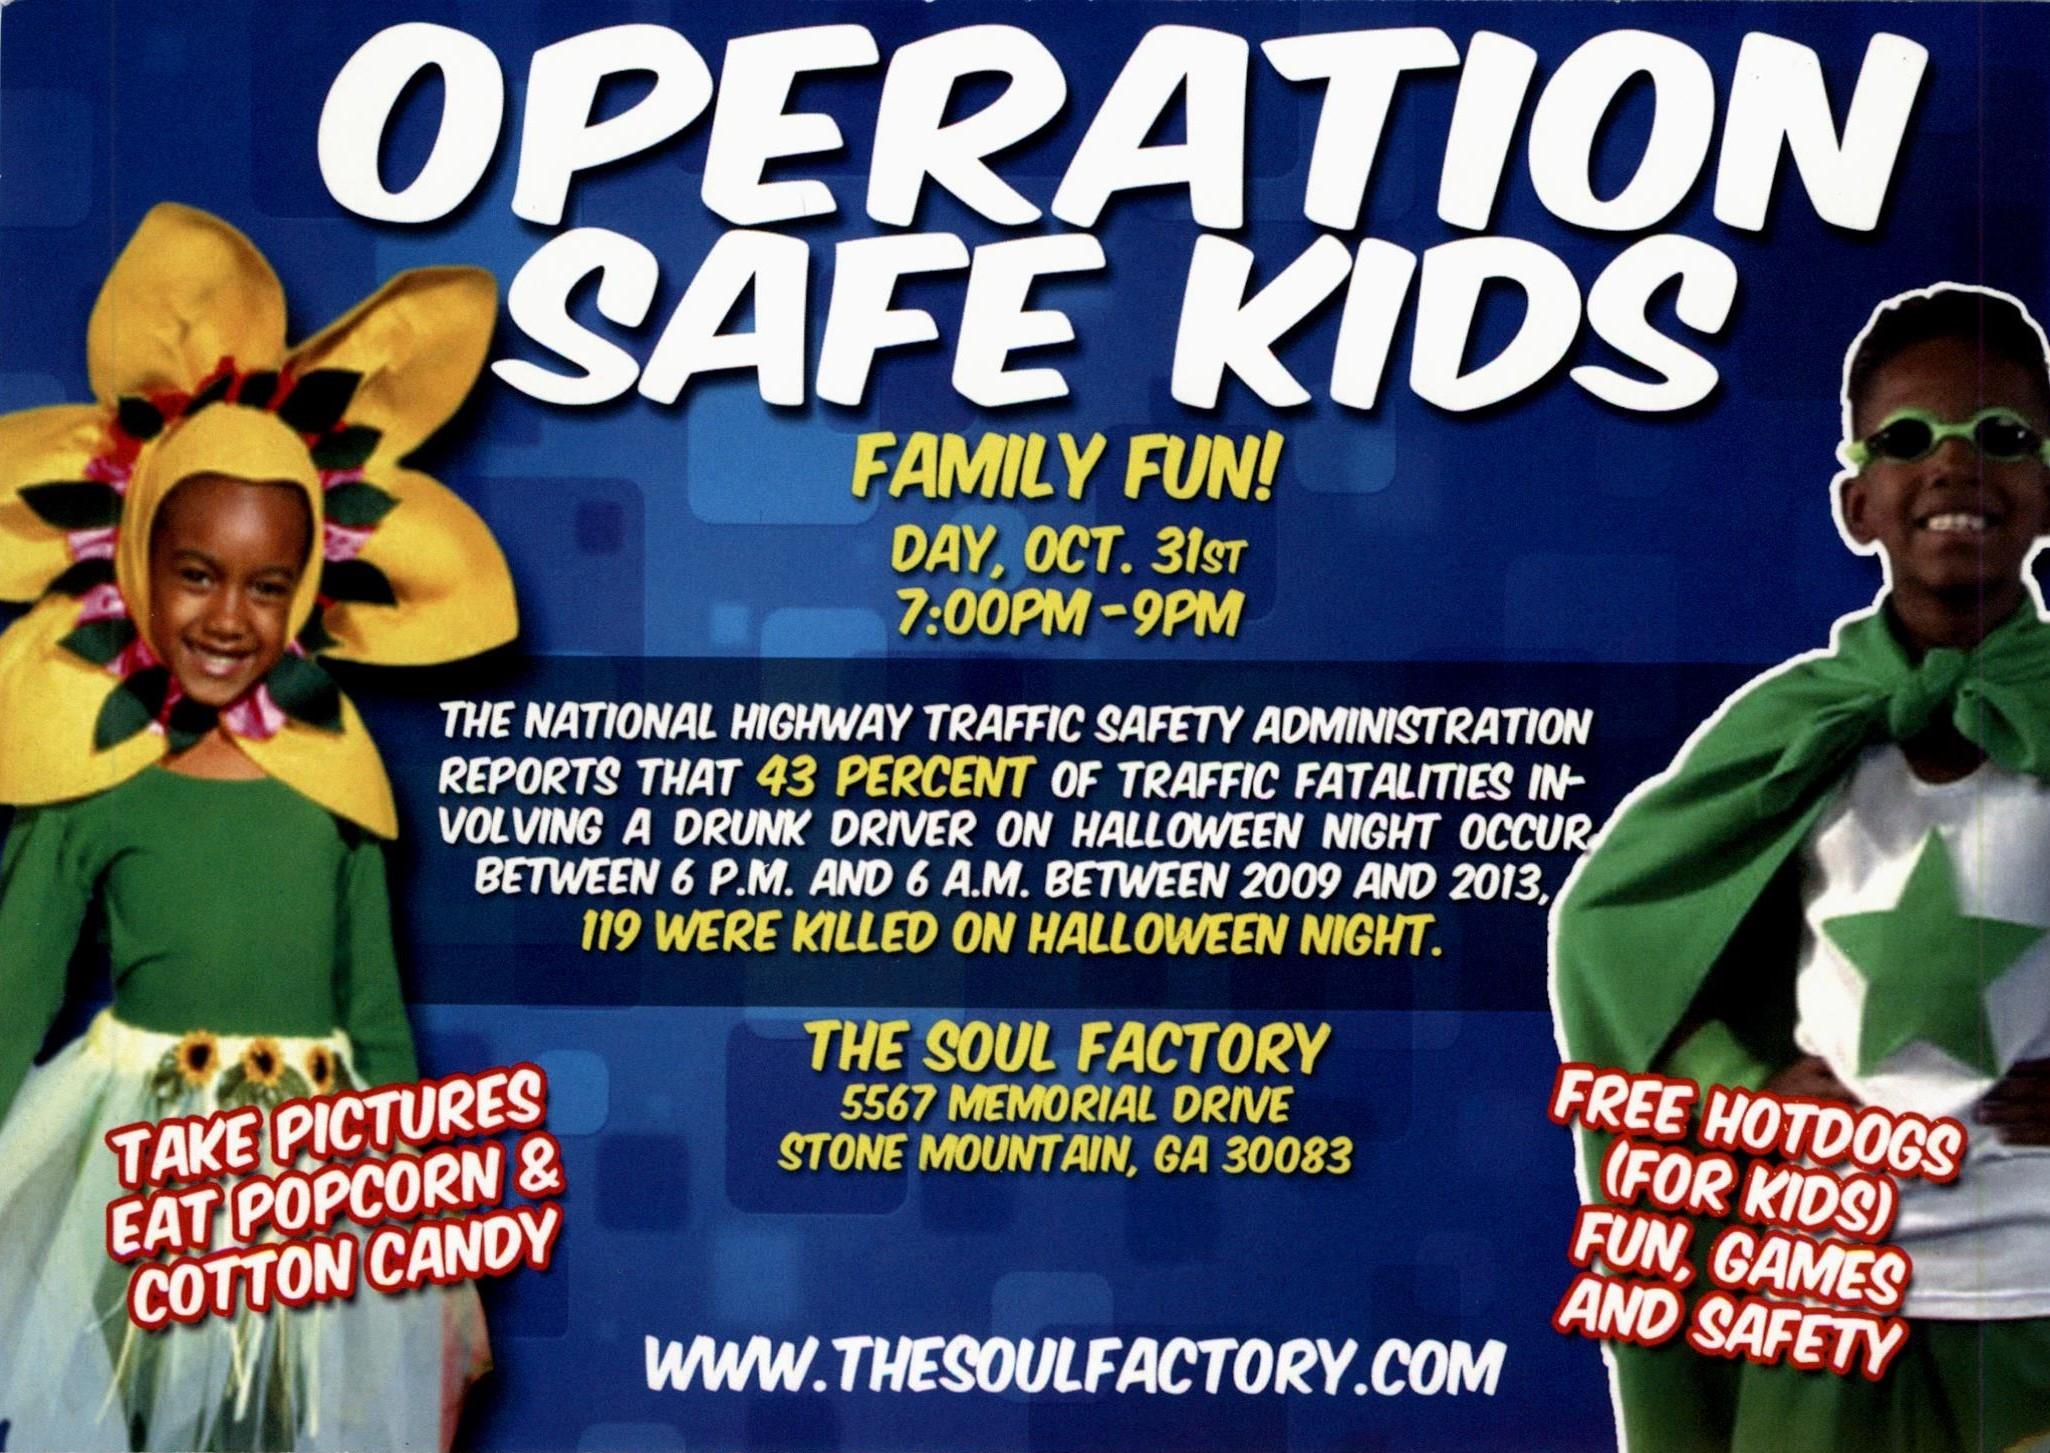 Operation Safe Kids Family Fun